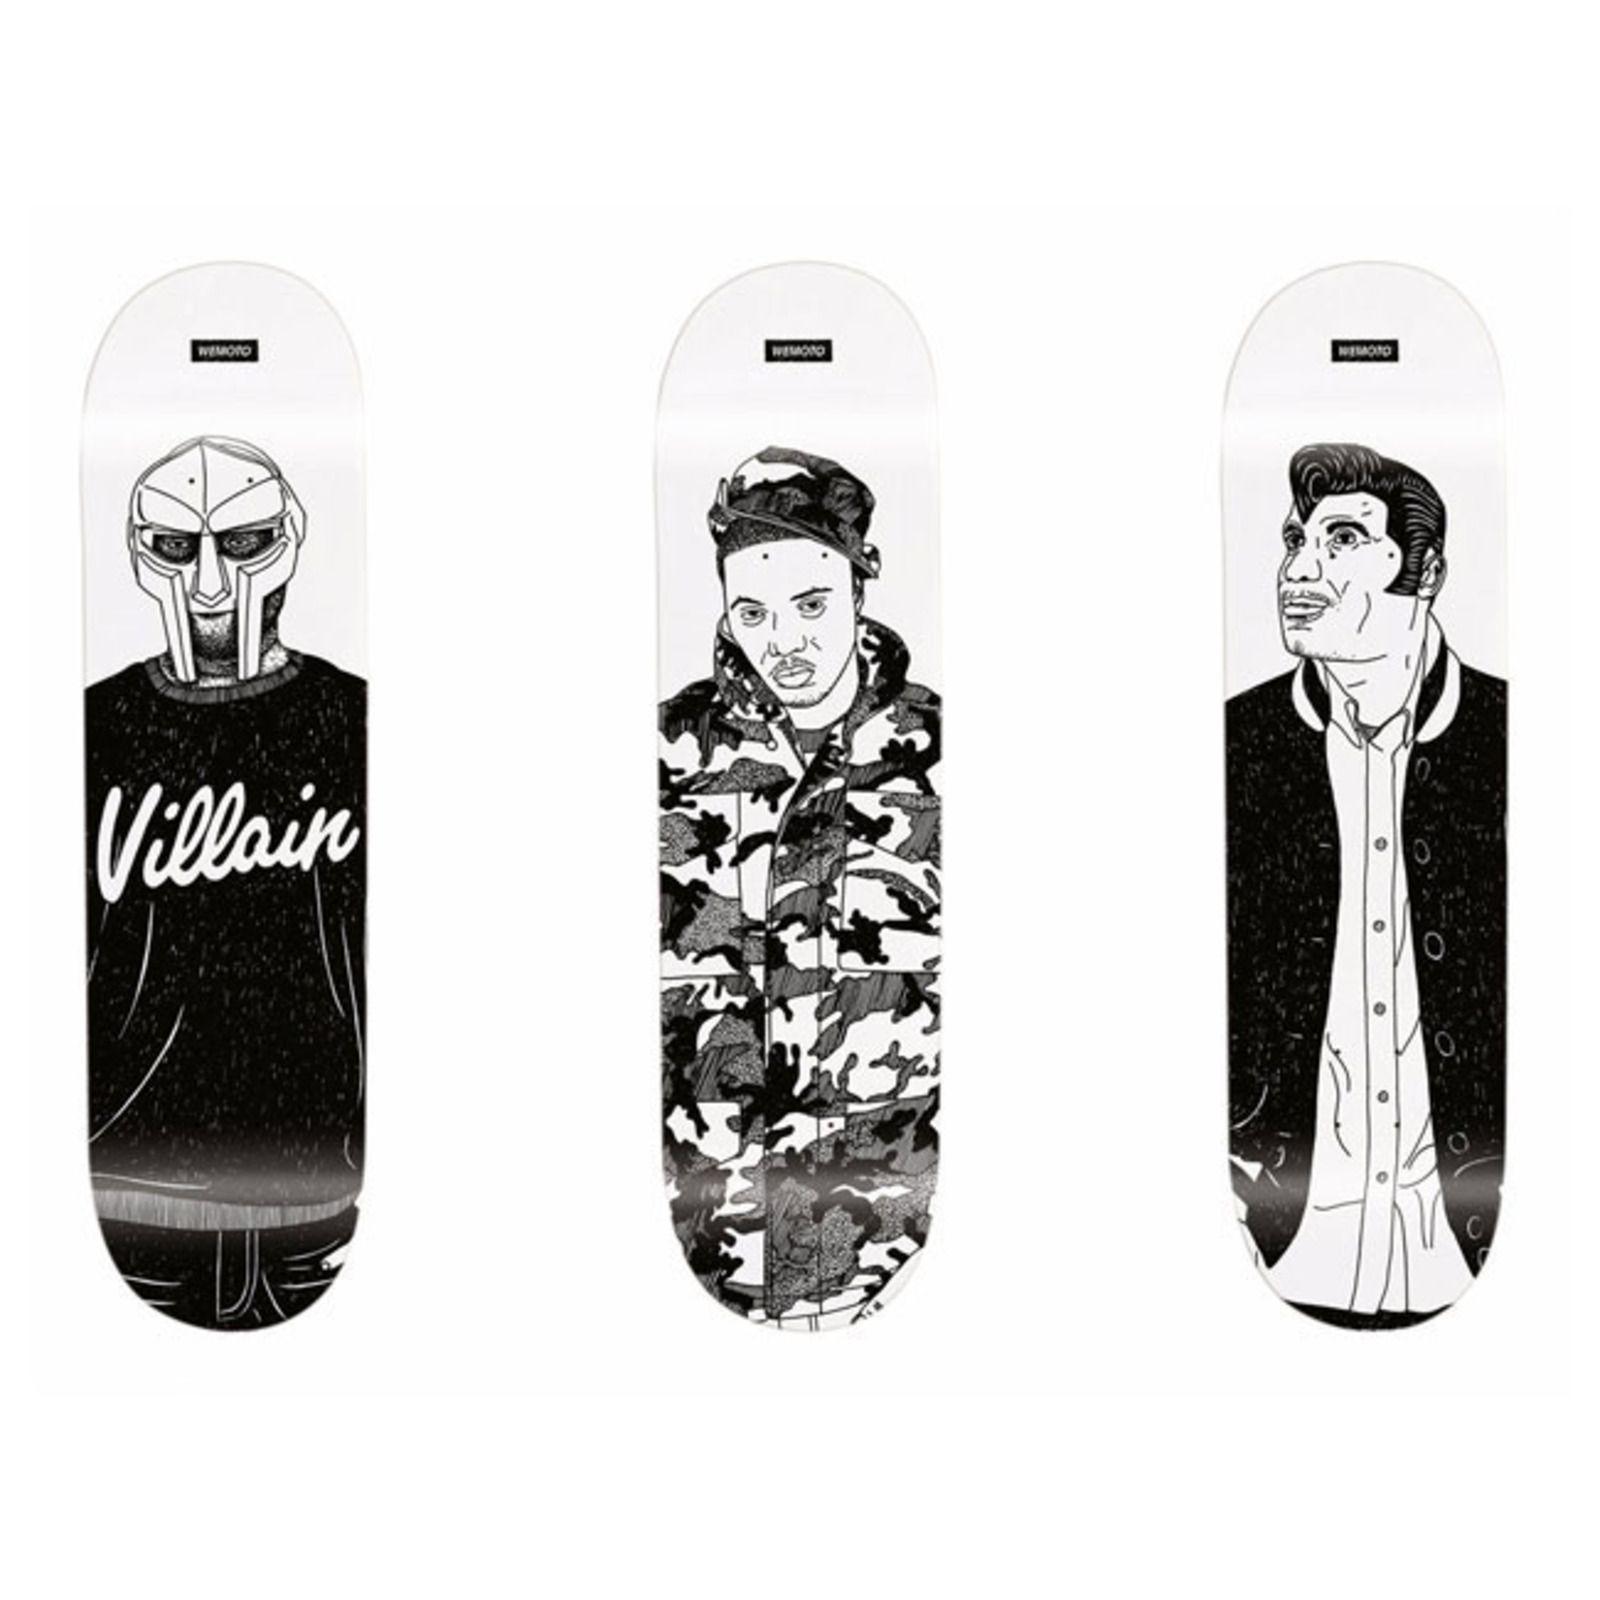 Wemoto Clothing Rap Idols Series Skateboard Skateboard Design Mf Doom